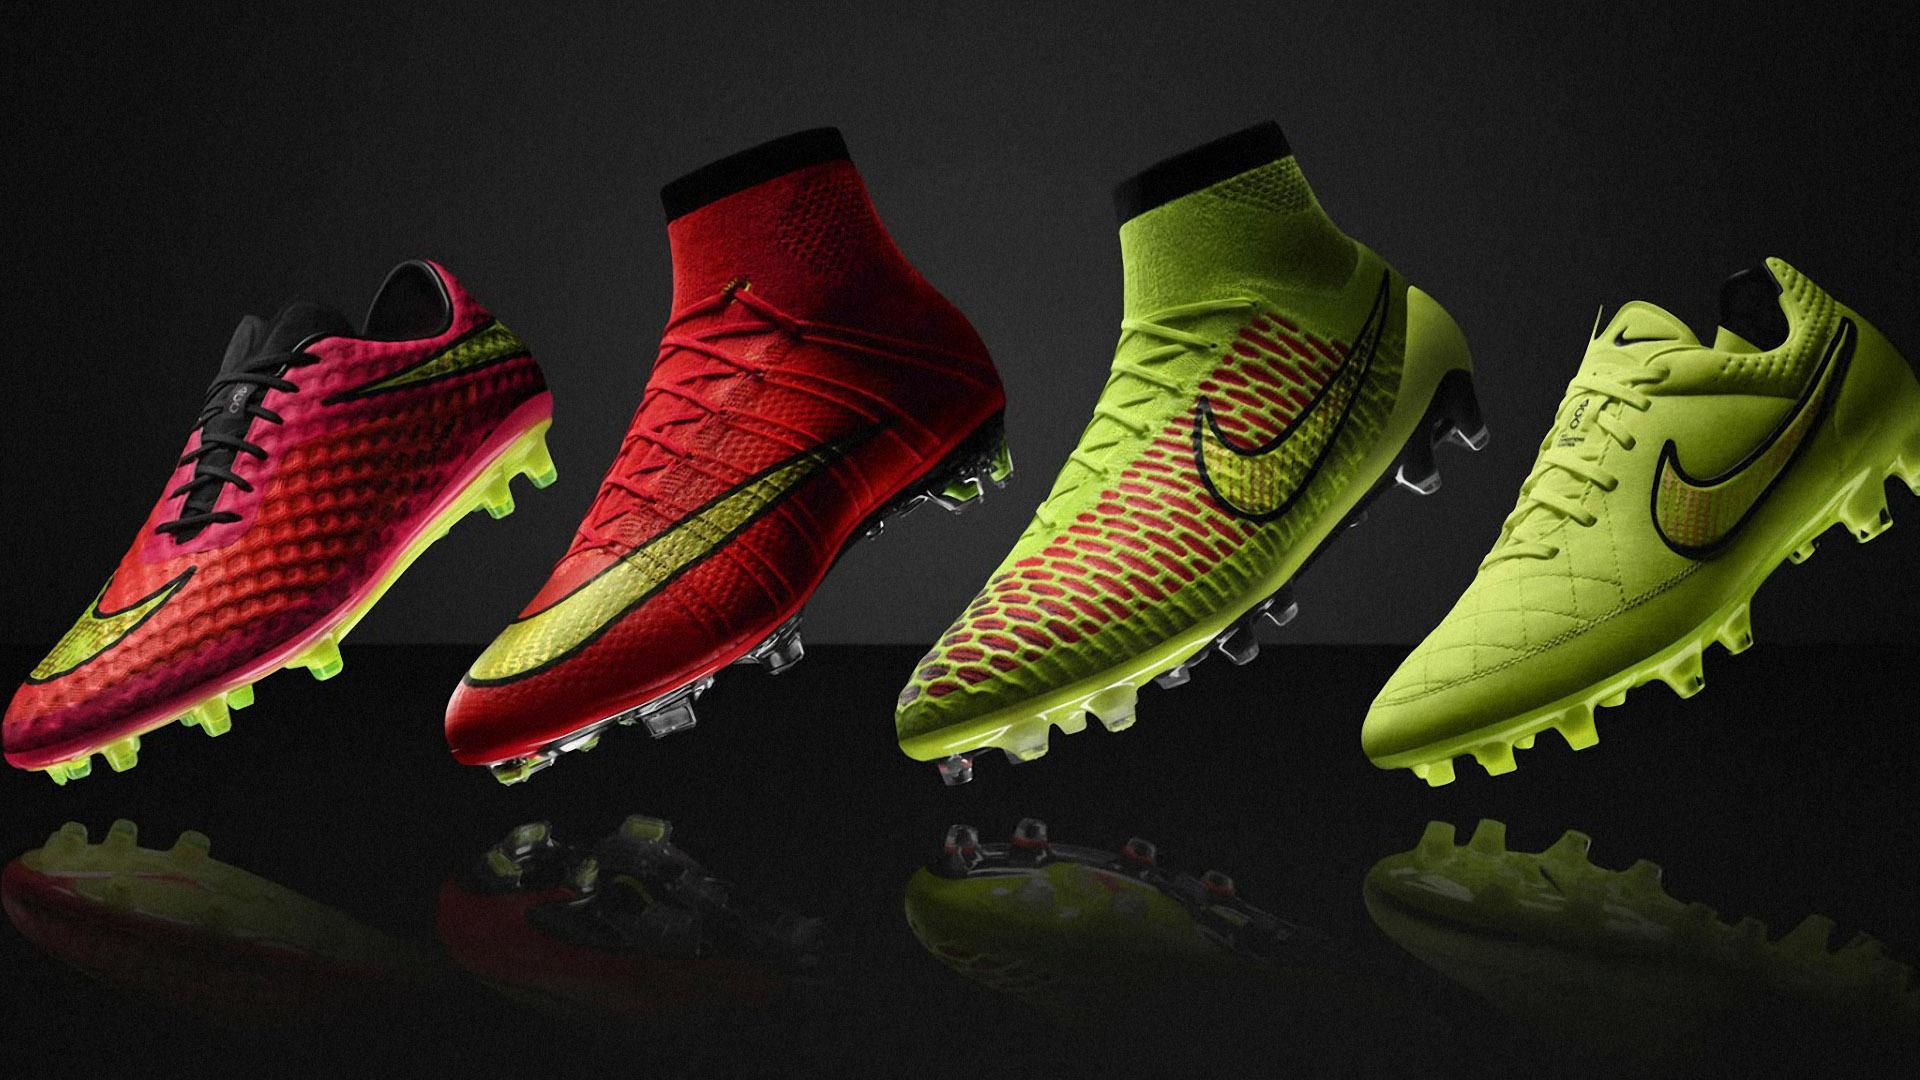 Download Nike Summer 2014 Football Boots HD Wallpaper 7233 Full Size 1920x1080